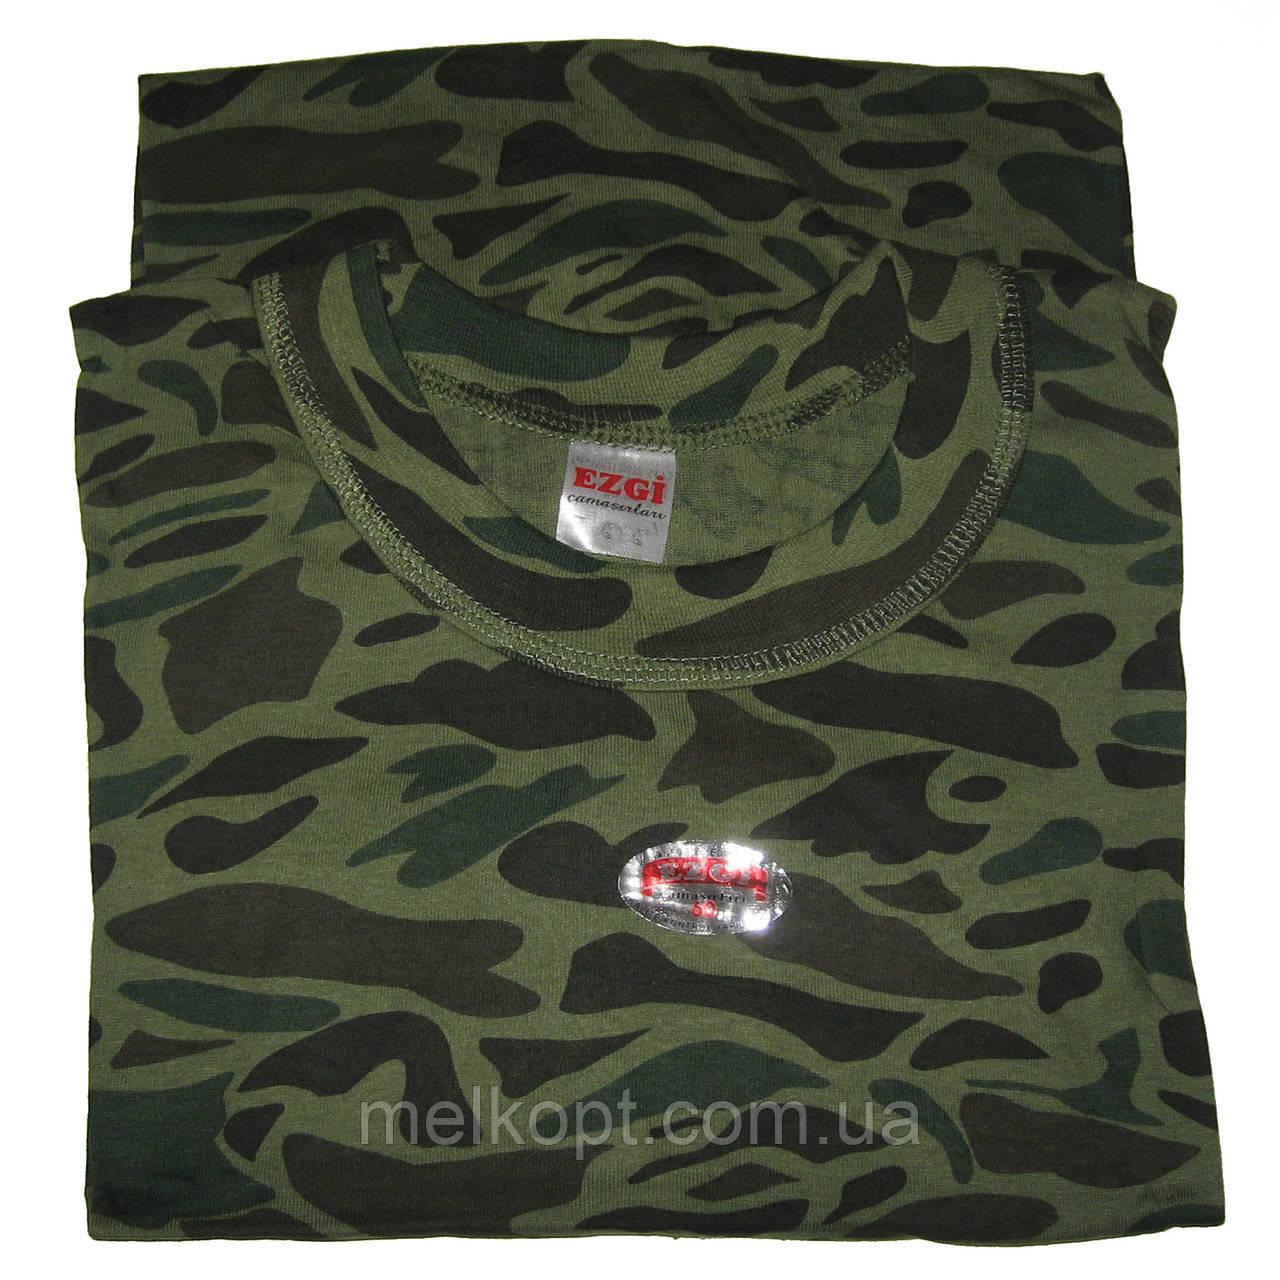 Мужские футболки Ezgi - 67,00 грн./шт. (70-й размер, хаки)